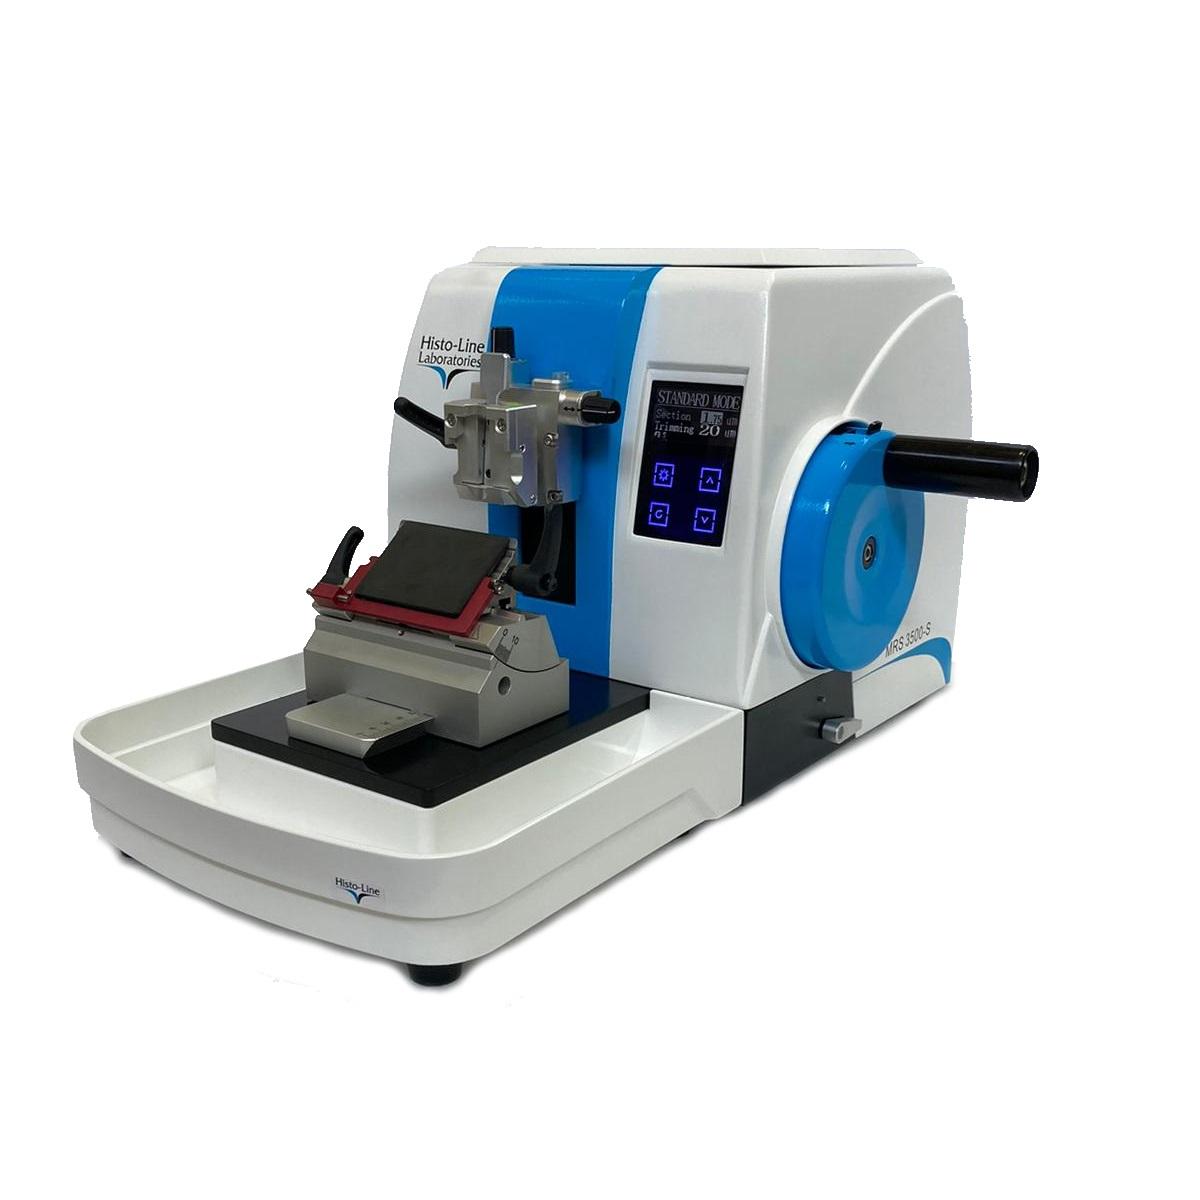 Semiautomatic programmable rotary microtome